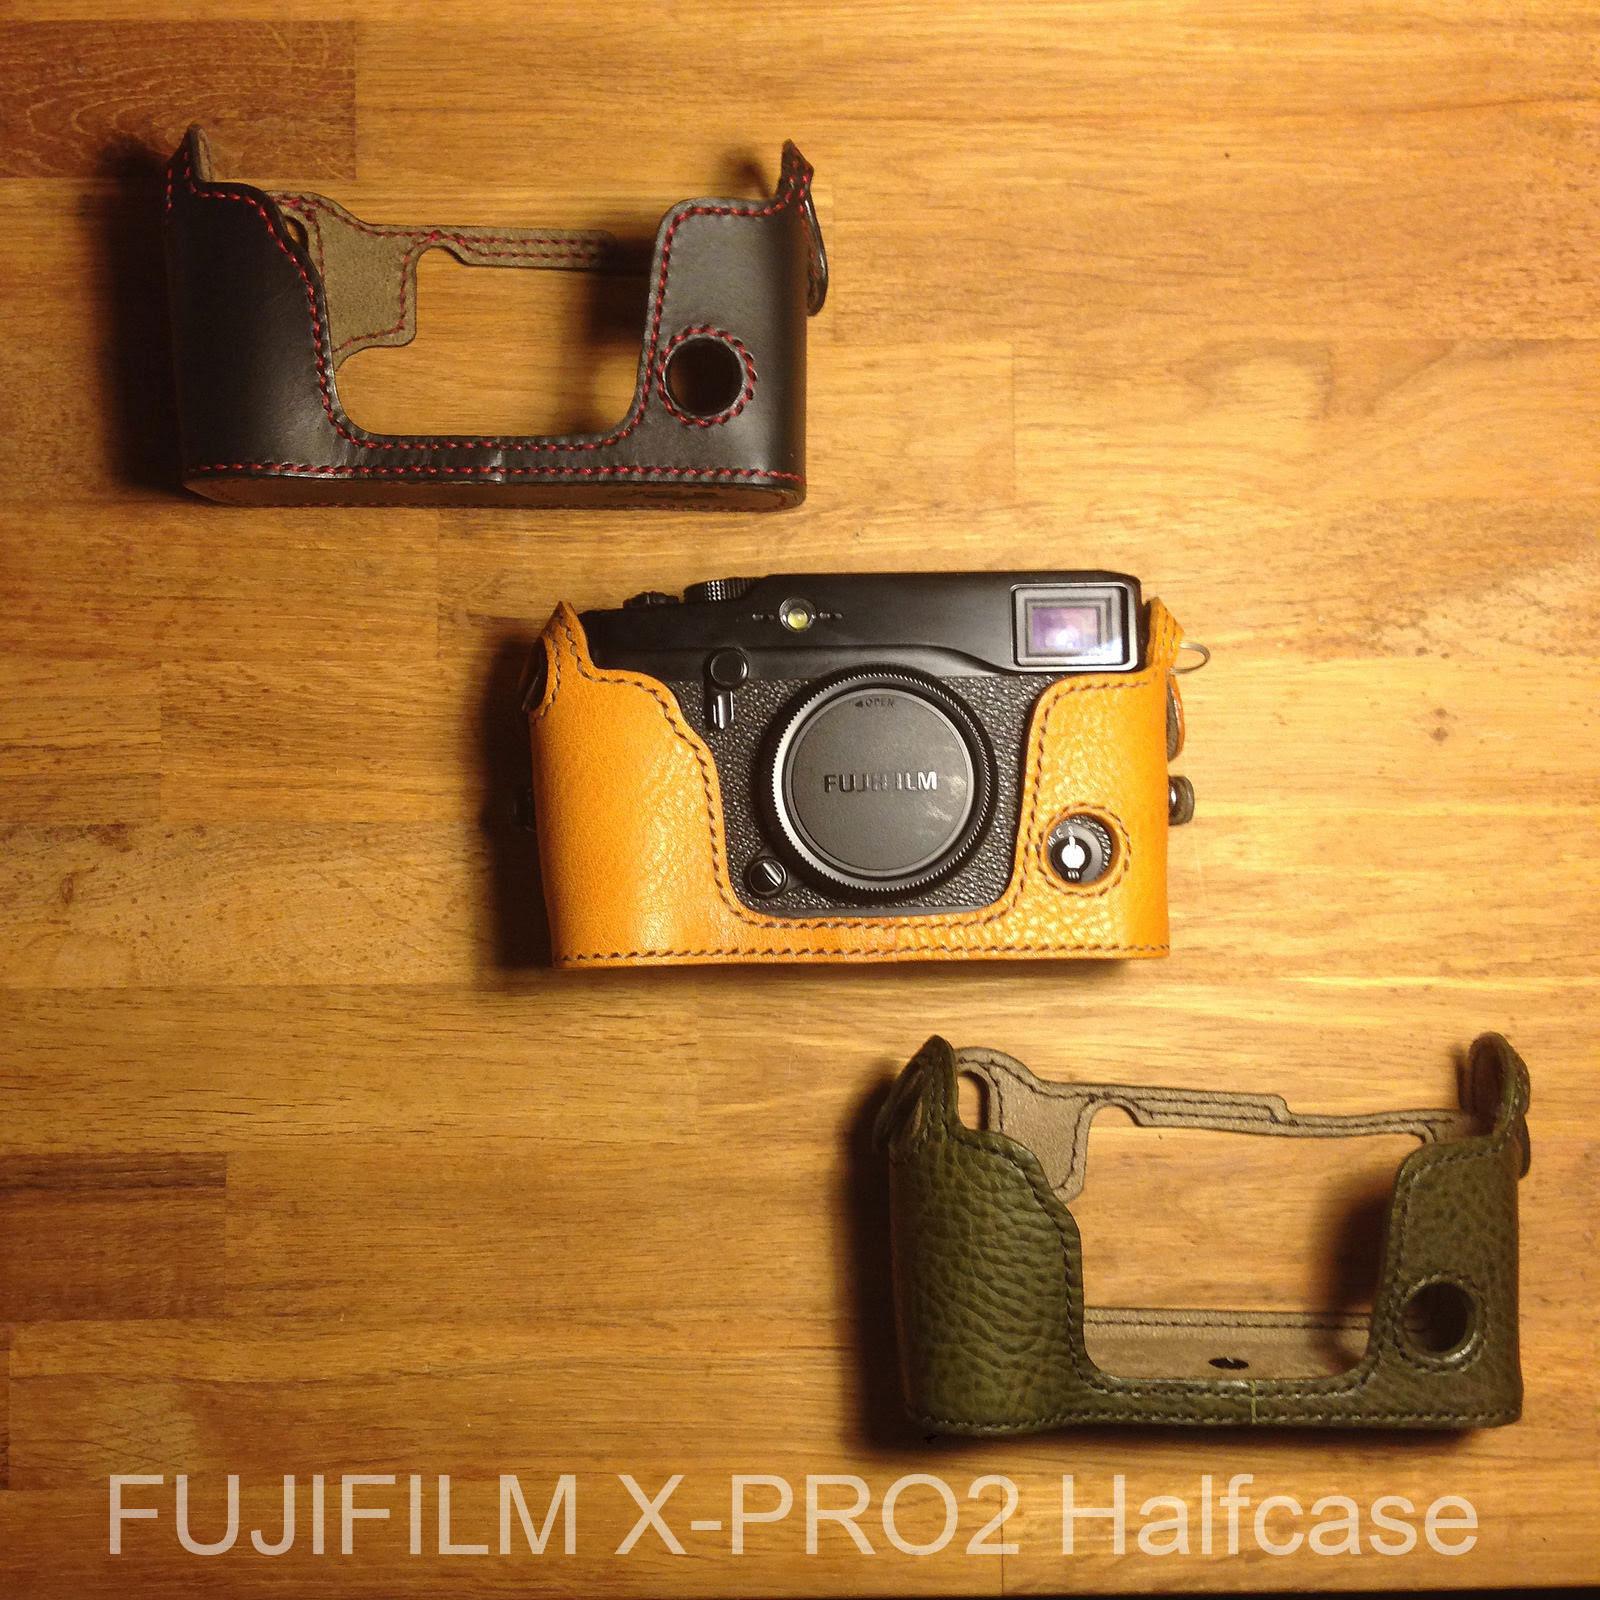 Xpro2 half case  Fuji XPro2 Kenjileather camera case